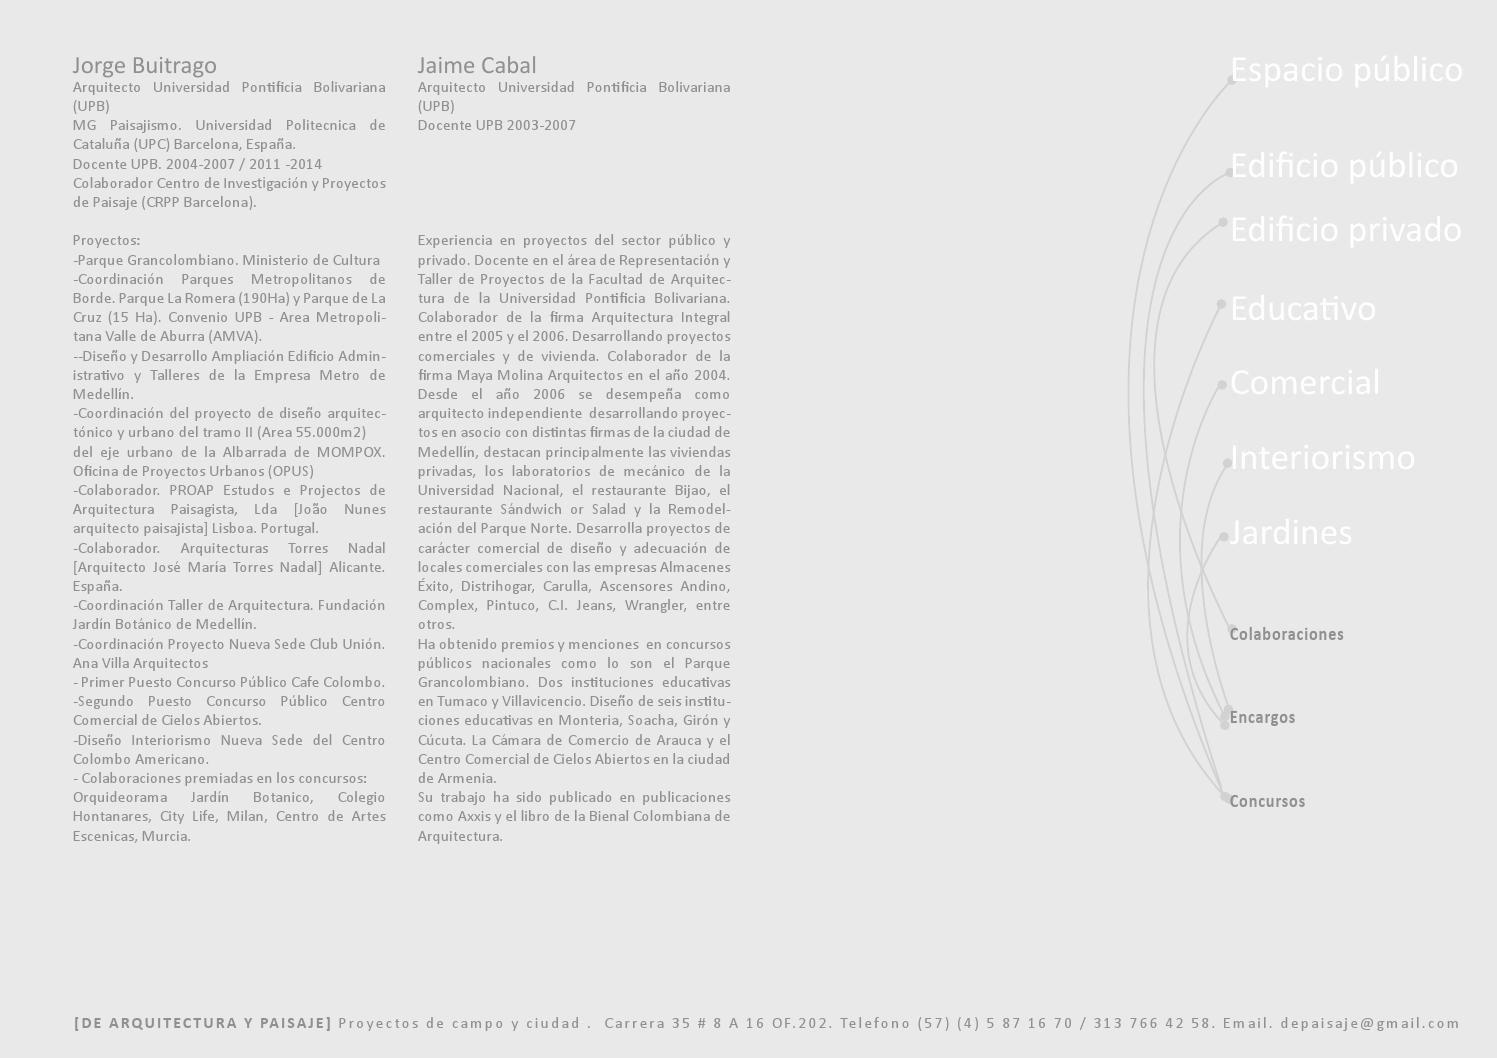 DE ARQUITECTURA Y PAISAJE  Portafolio 2014-01. Jorge Buitrago / Jaime Cabal